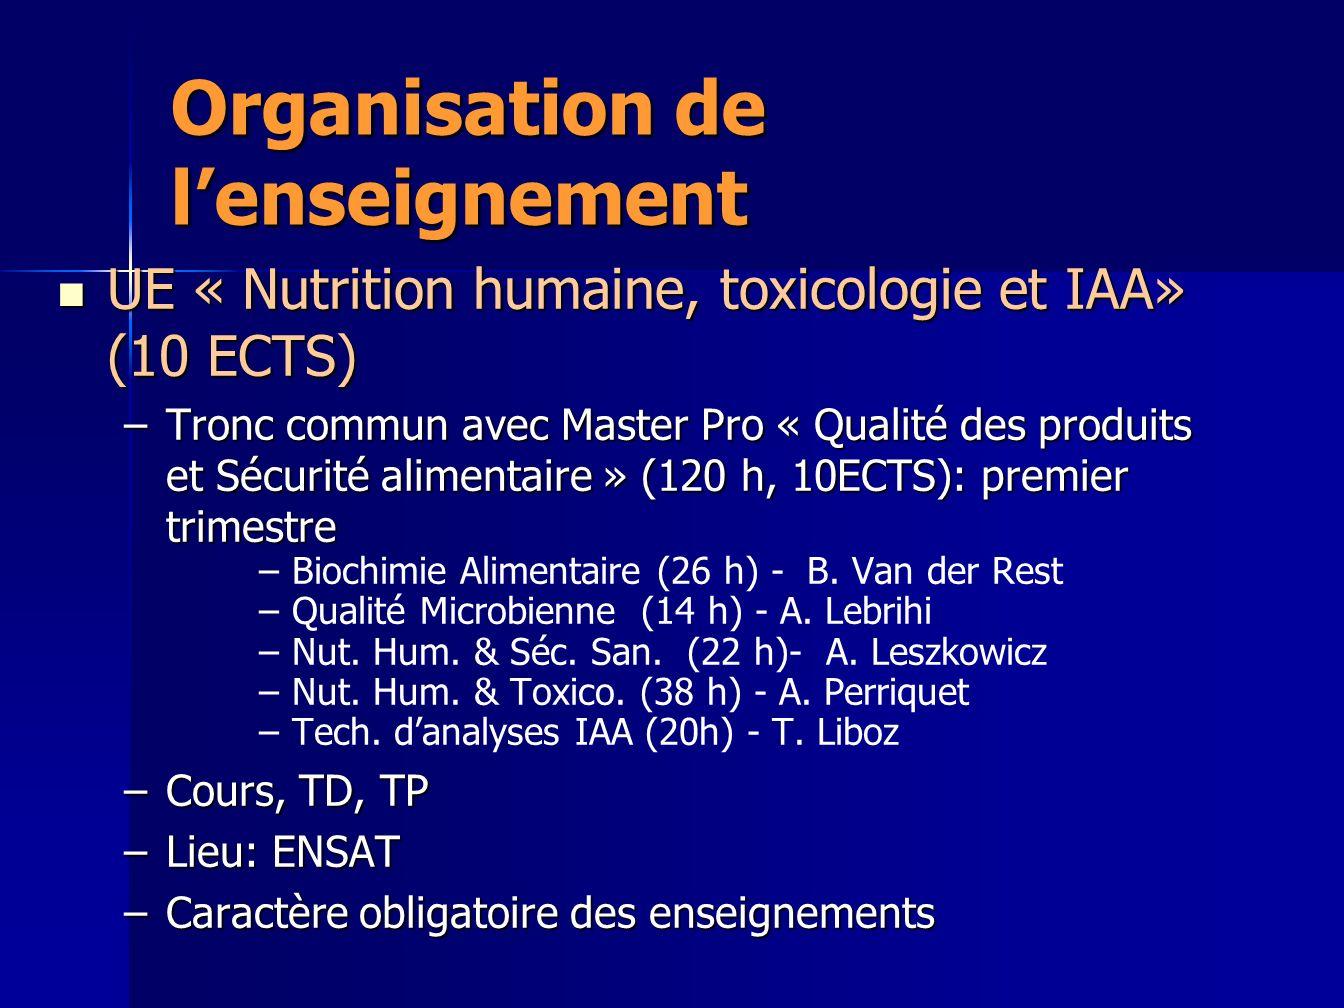 Organisation de lenseignement UE « Nutrition humaine, toxicologie et IAA» (10 ECTS) UE « Nutrition humaine, toxicologie et IAA» (10 ECTS) –Tronc commu